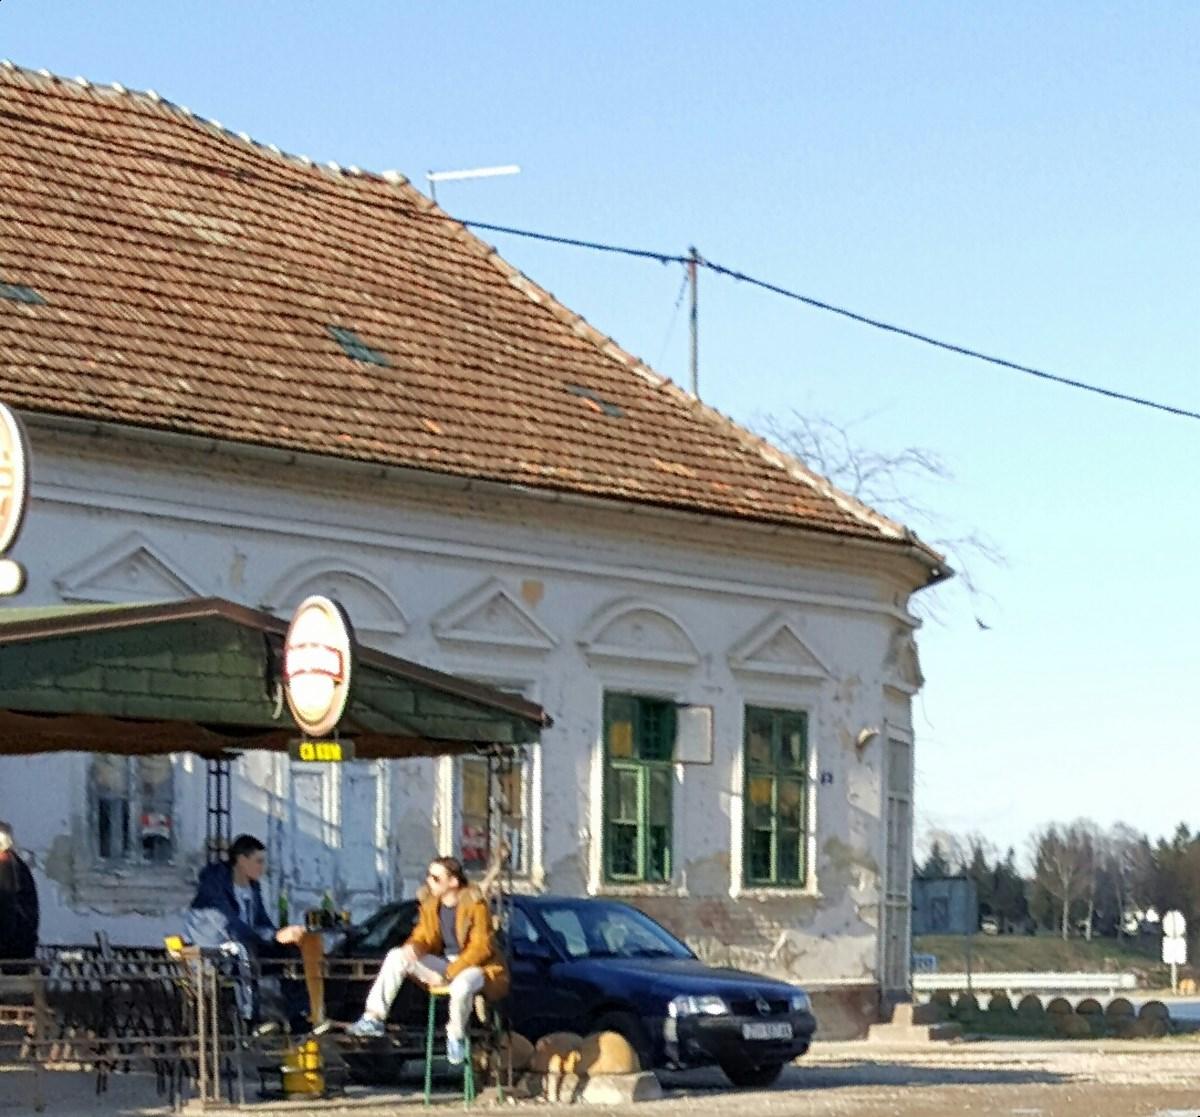 Caffe bar Kum